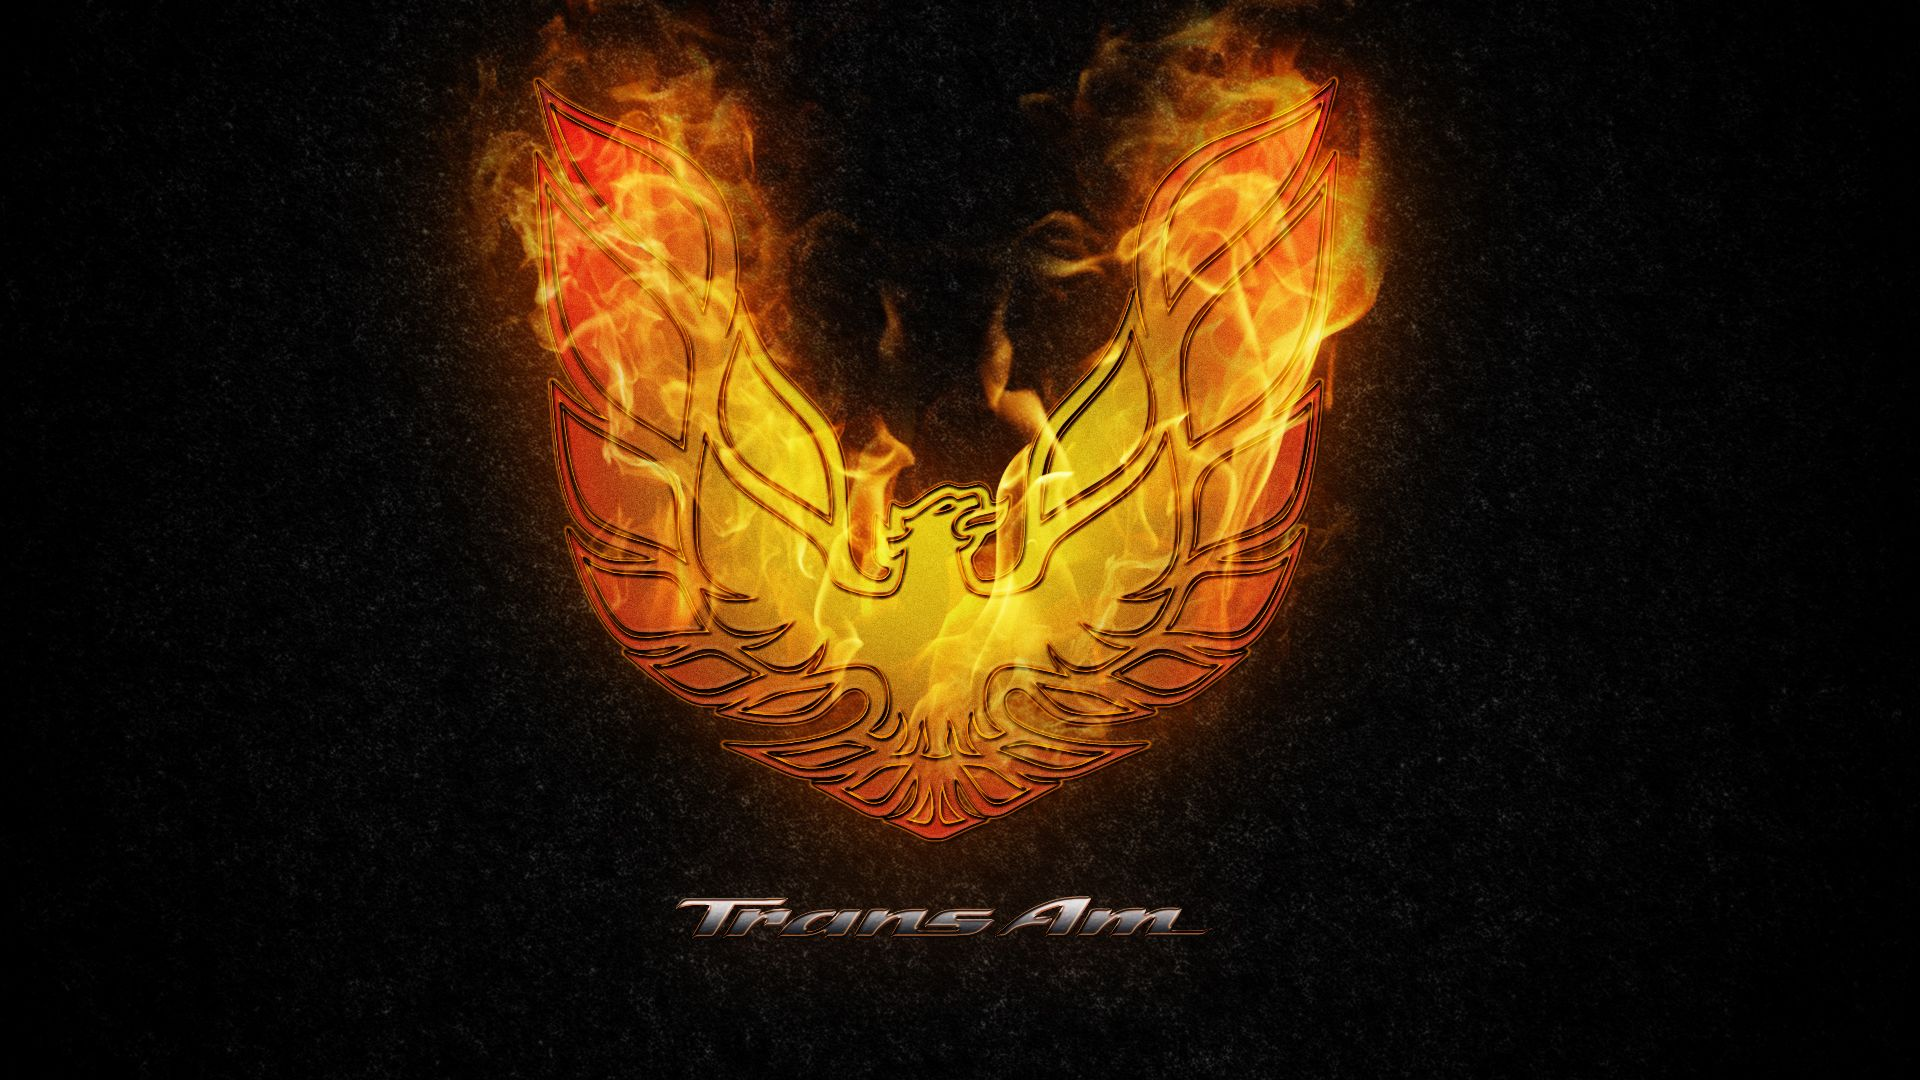 trans am logo tattoo trans am logo tattoo image 405 trans am phoenix colorful tattoo. Black Bedroom Furniture Sets. Home Design Ideas